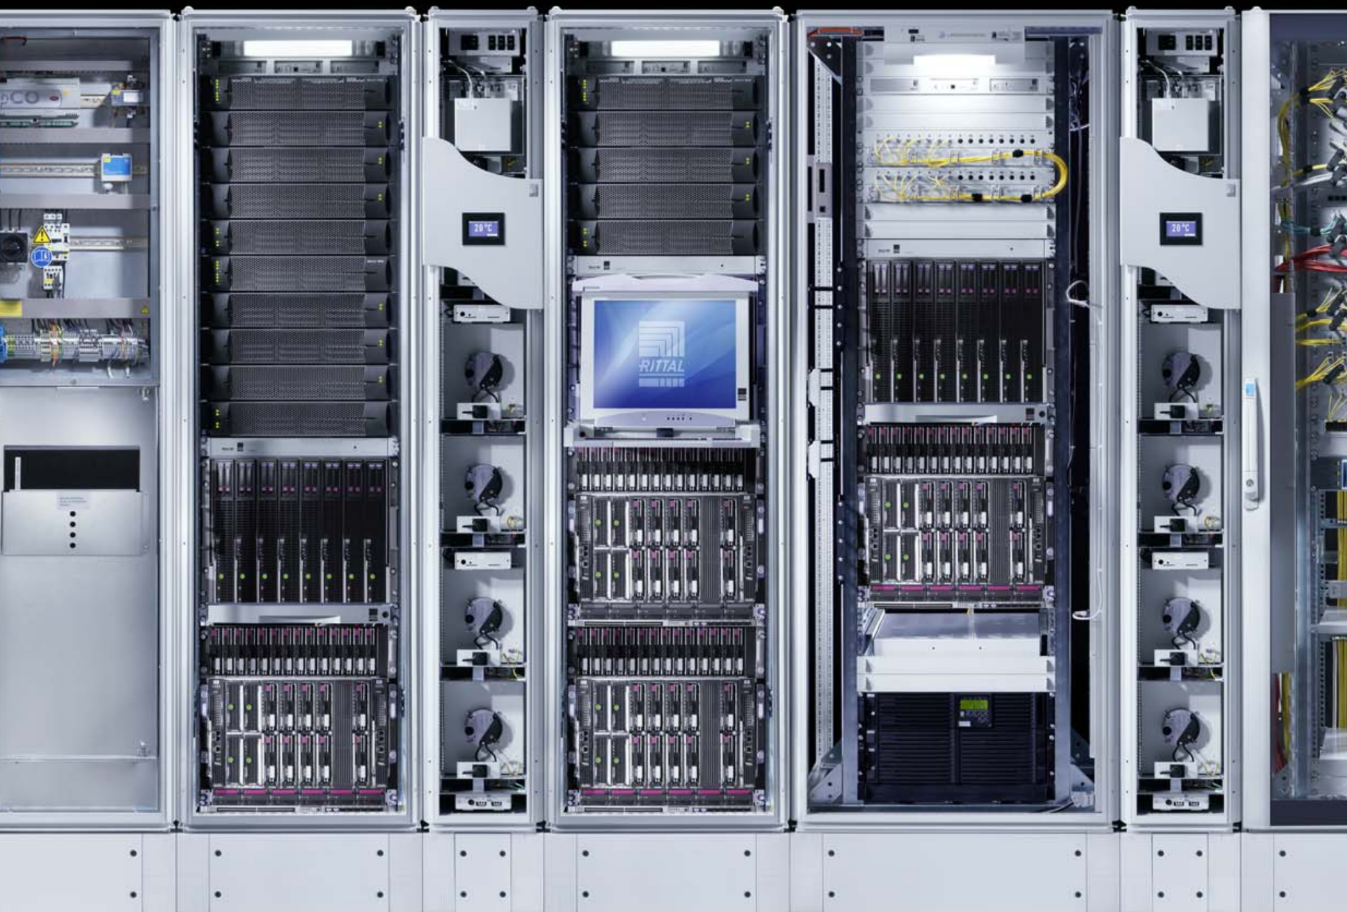 Rittal_micro data center_system